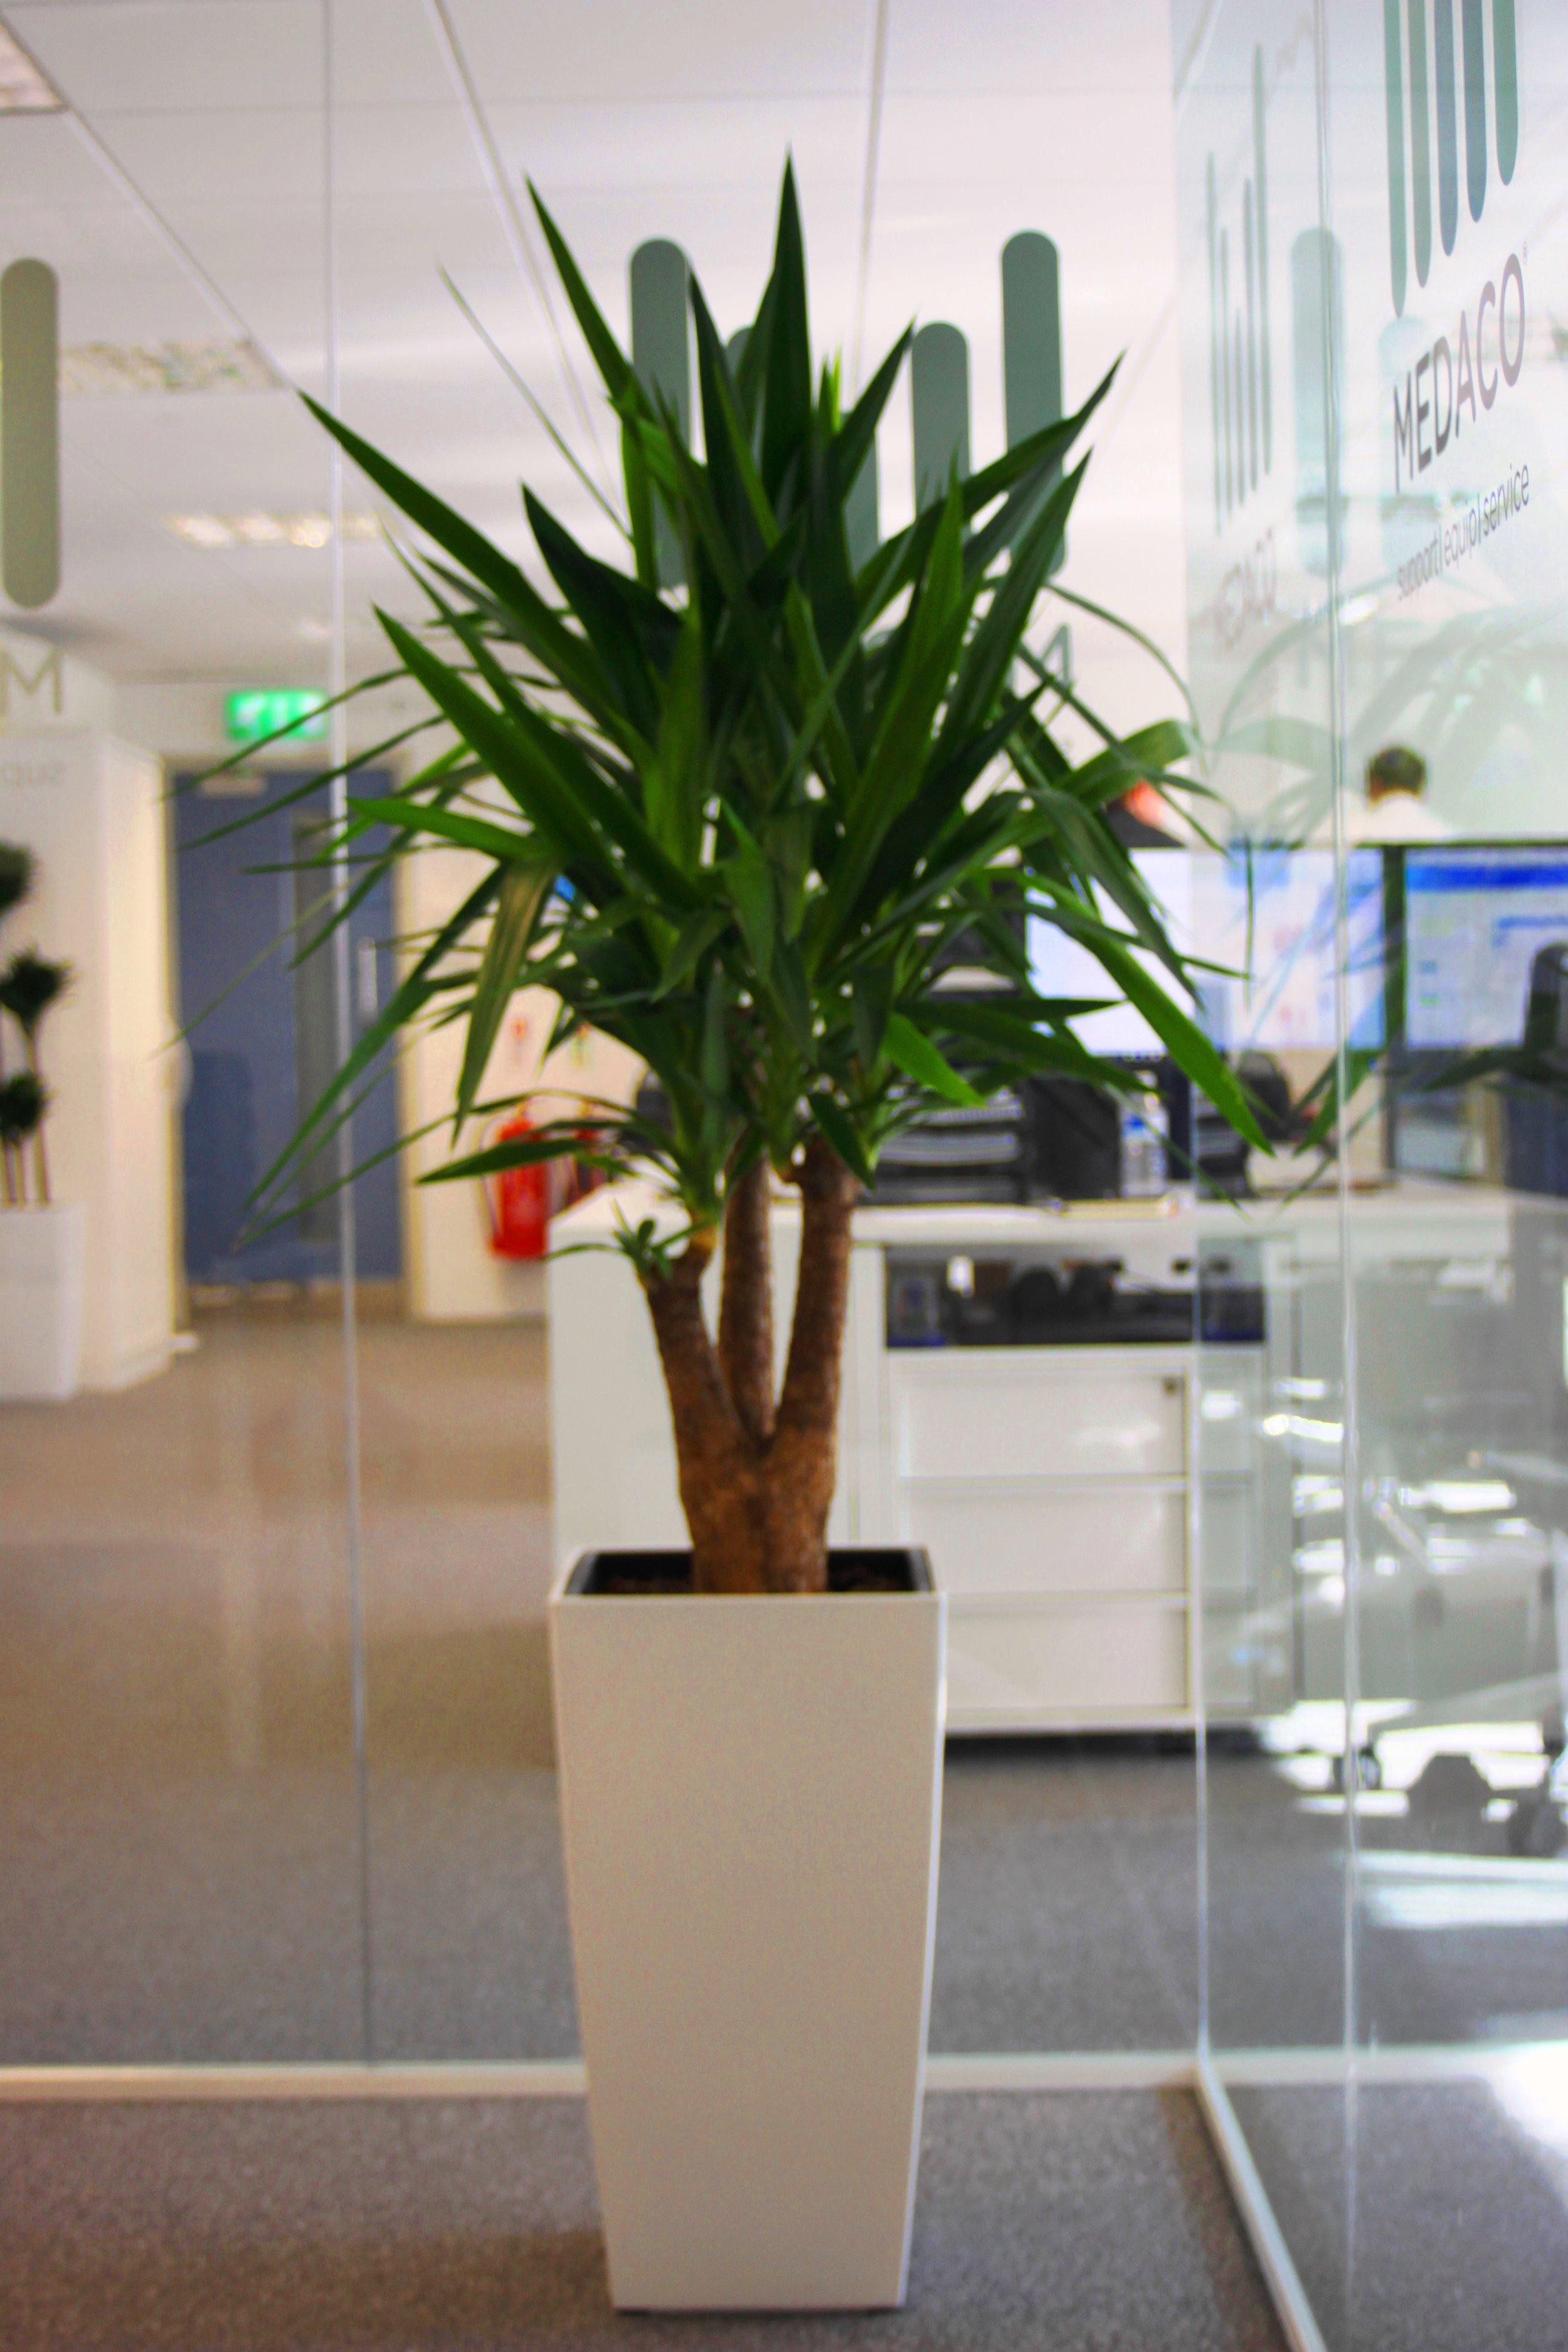 medaco-plantcare-interior-plants-trees-bristol-image-2